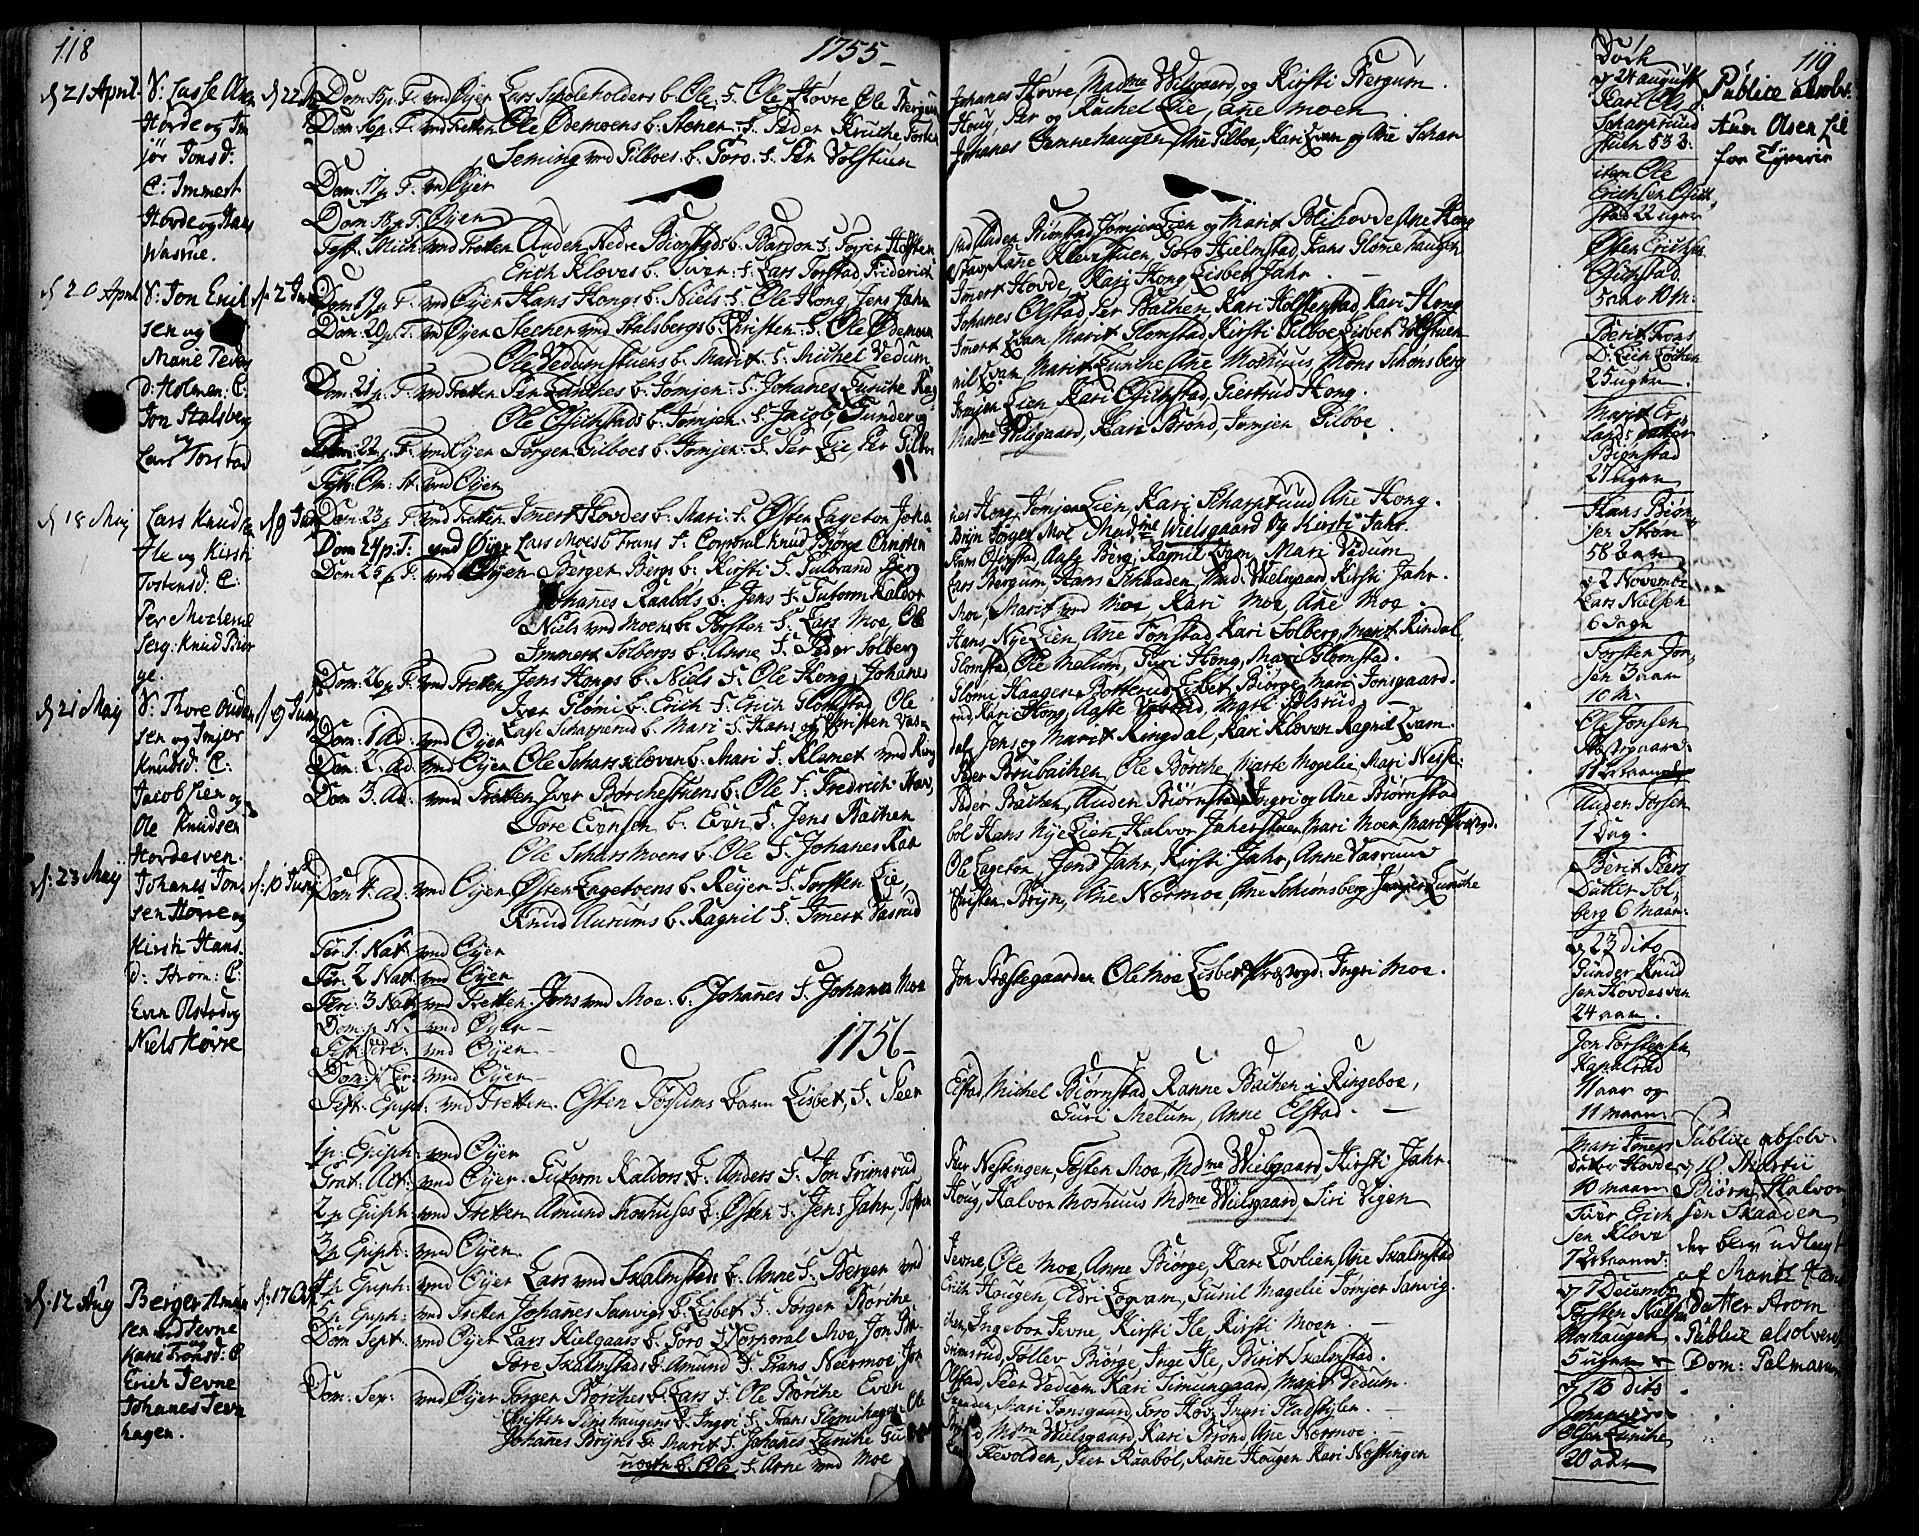 SAH, Øyer prestekontor, Ministerialbok nr. 2, 1733-1784, s. 118-119